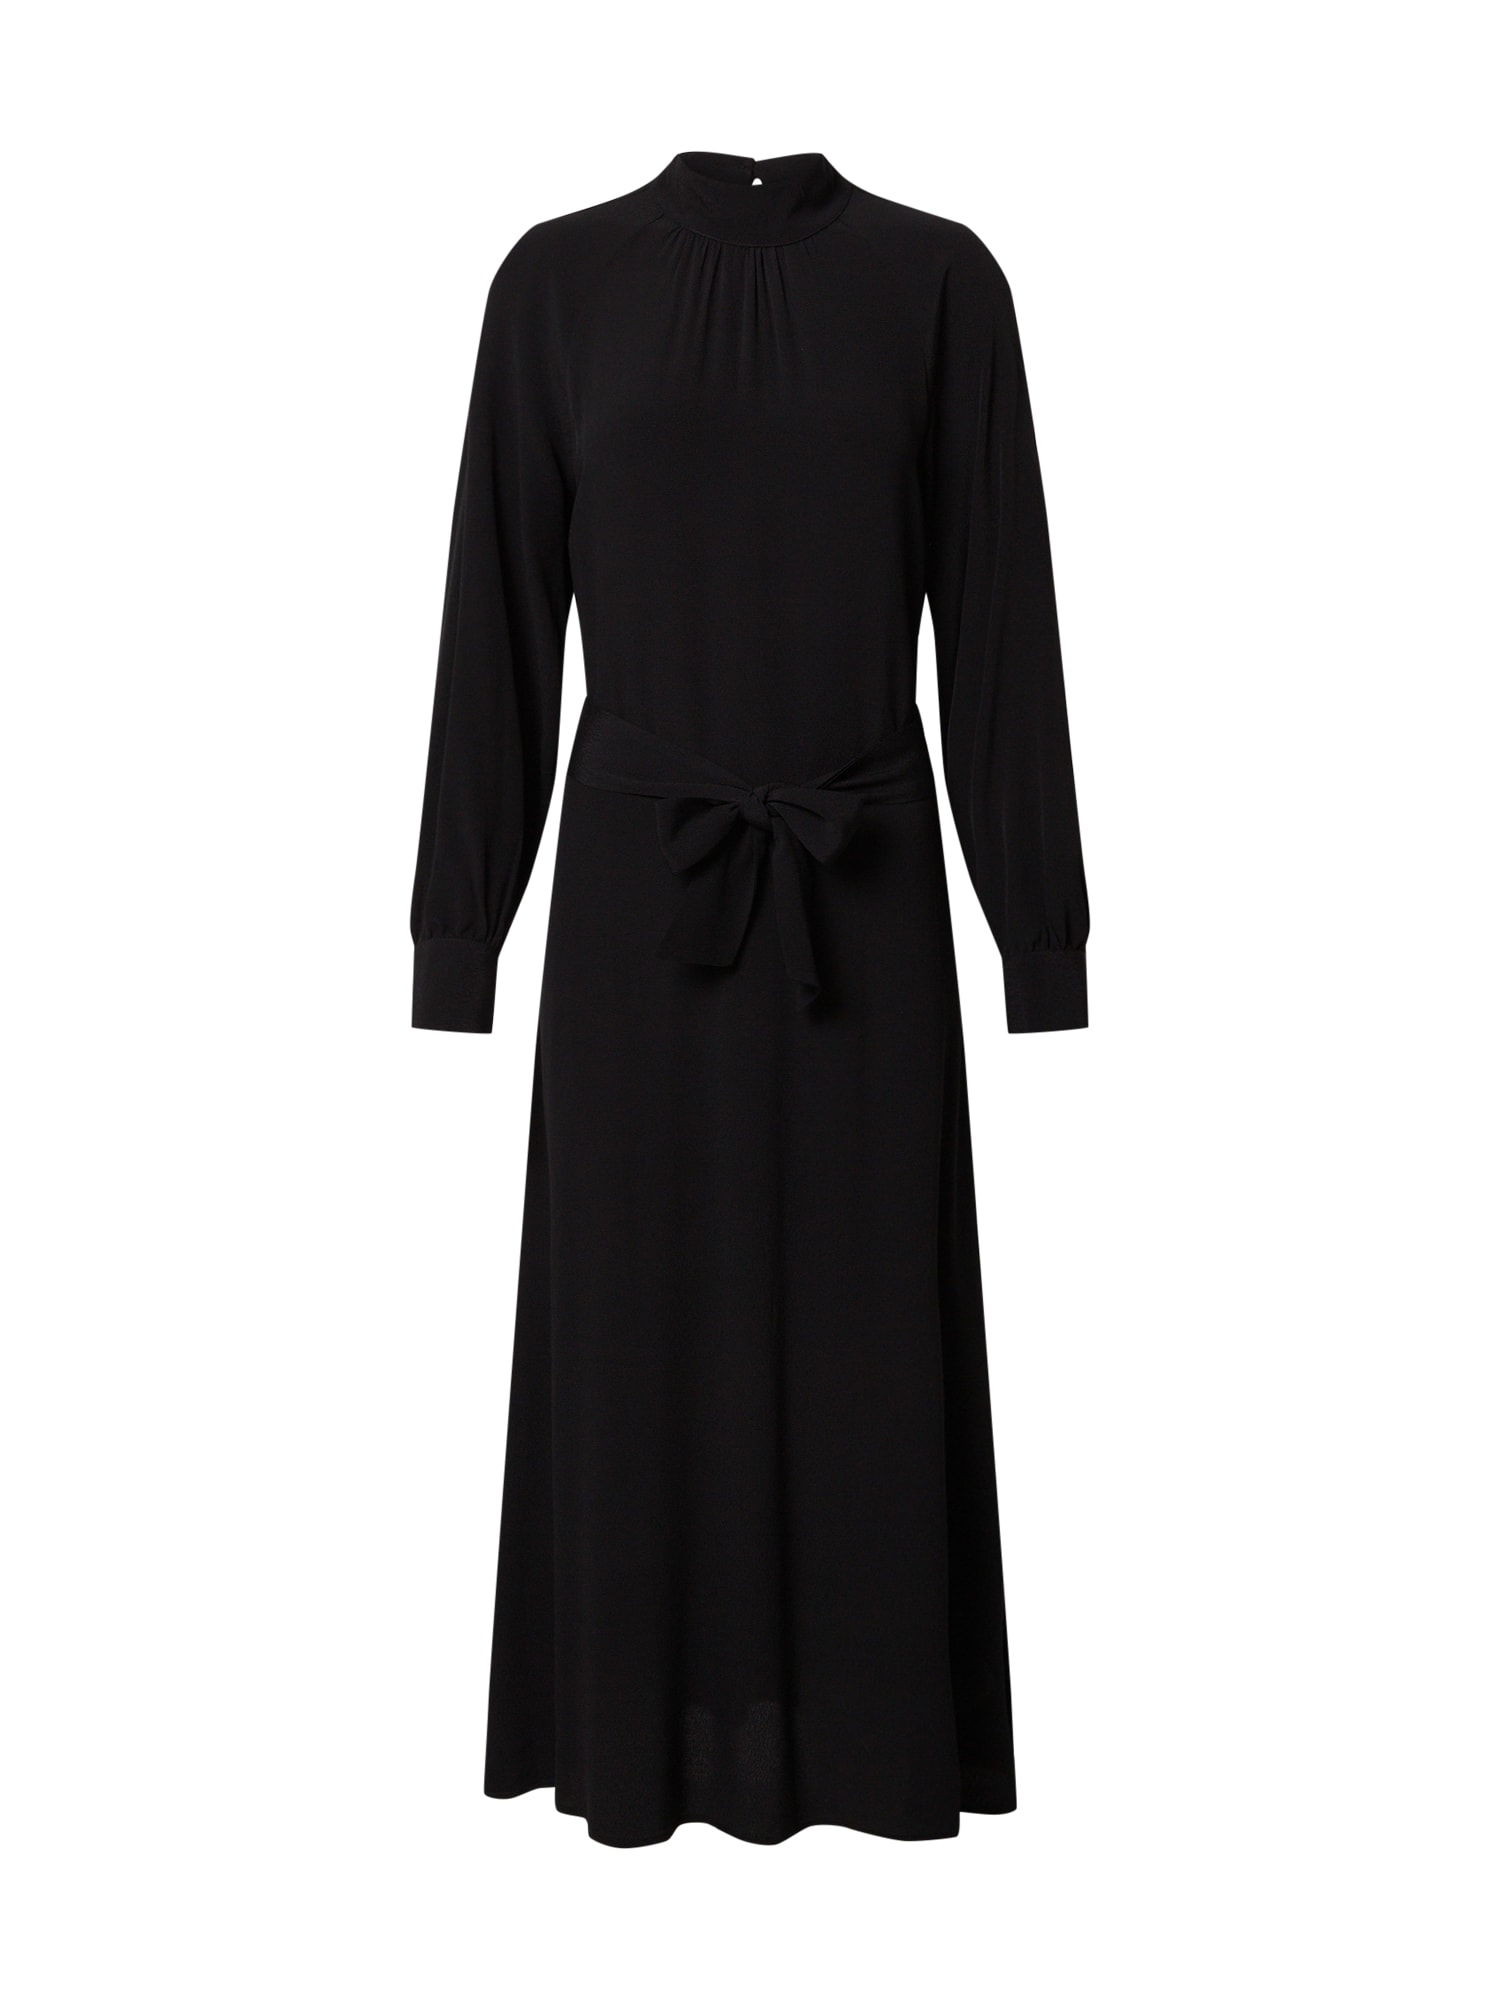 EDITED Suknelė 'Indira' juoda